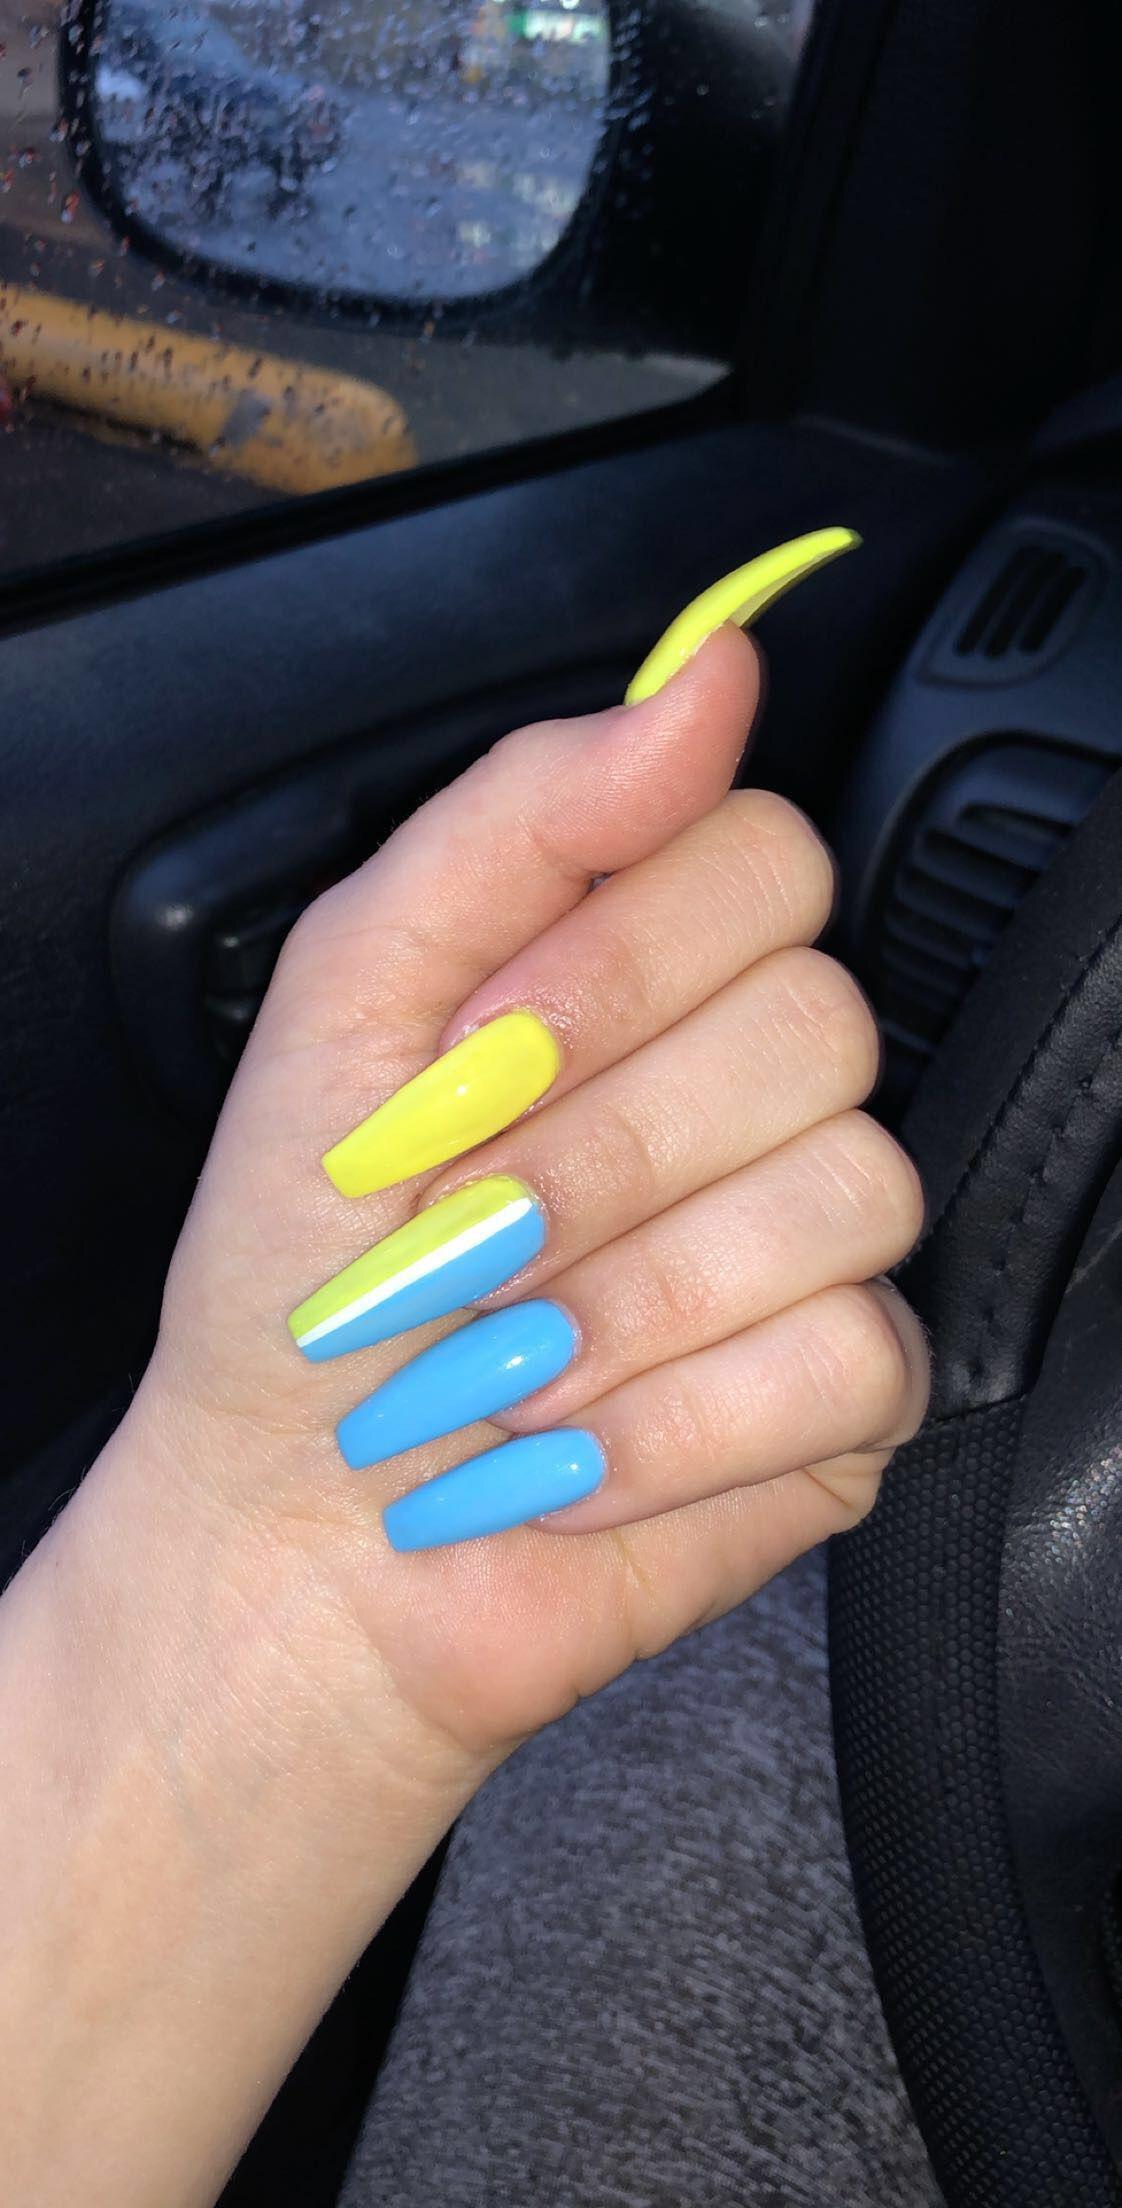 Long Coffin Acrylic Nails Blue Yellow Yellow Nails Blue Acrylic Nails Blue Nails